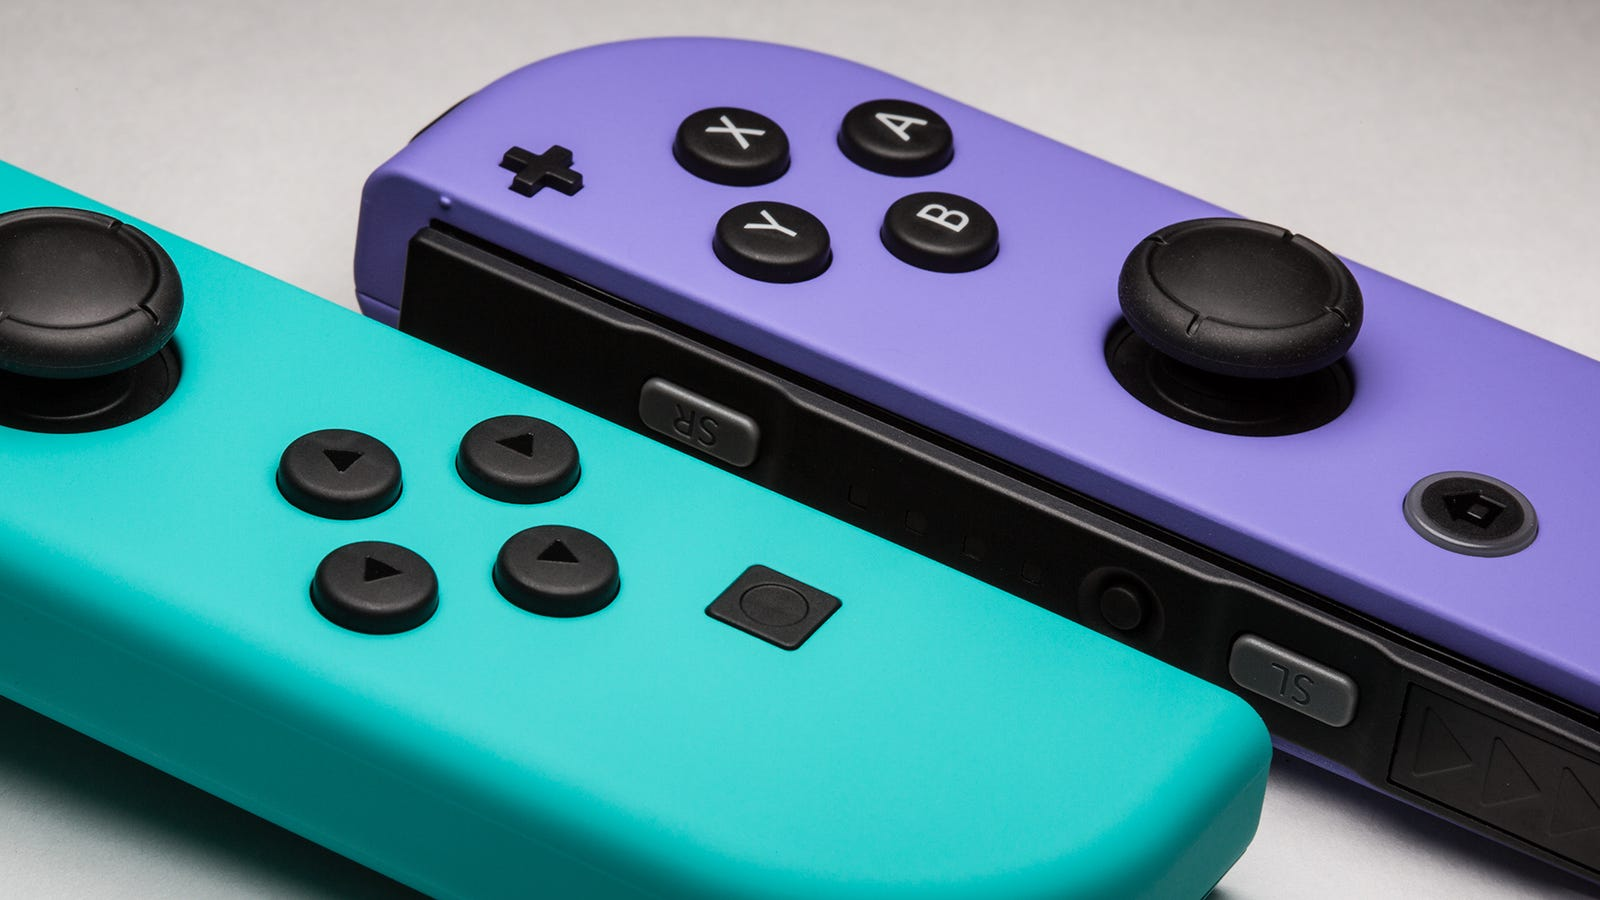 Report: Nintendo Will Fix Broken Joy-Cons For Free, Refund Prior Repairs